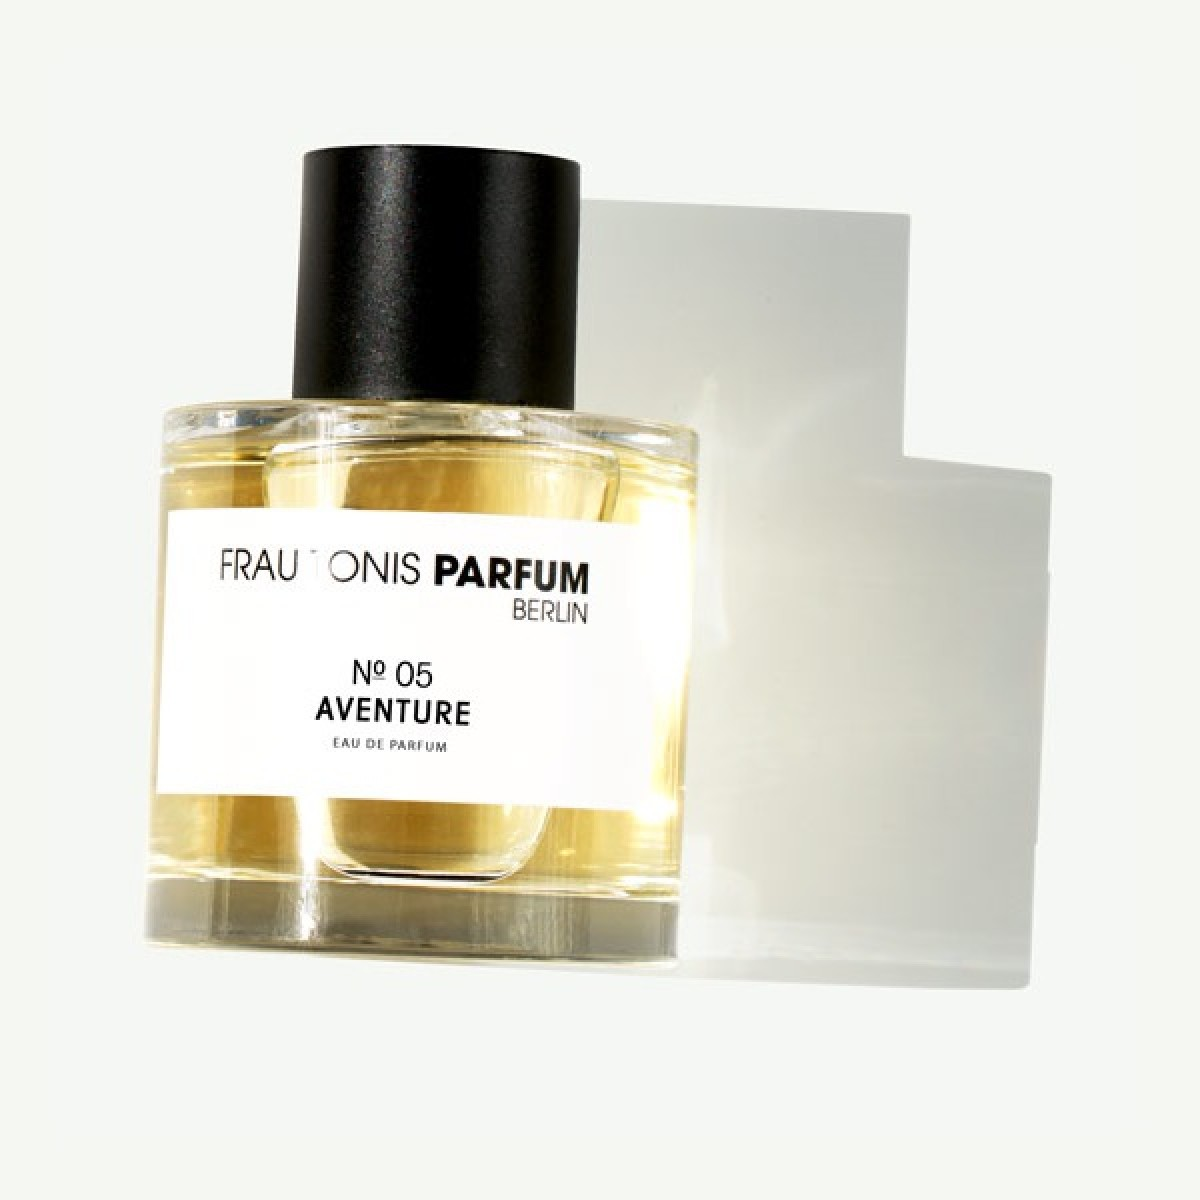 Frau Tonis Parfum No. 05 AVENTURE (pfeffrig, holzig, maritim), 50 ml Eau de Parfum